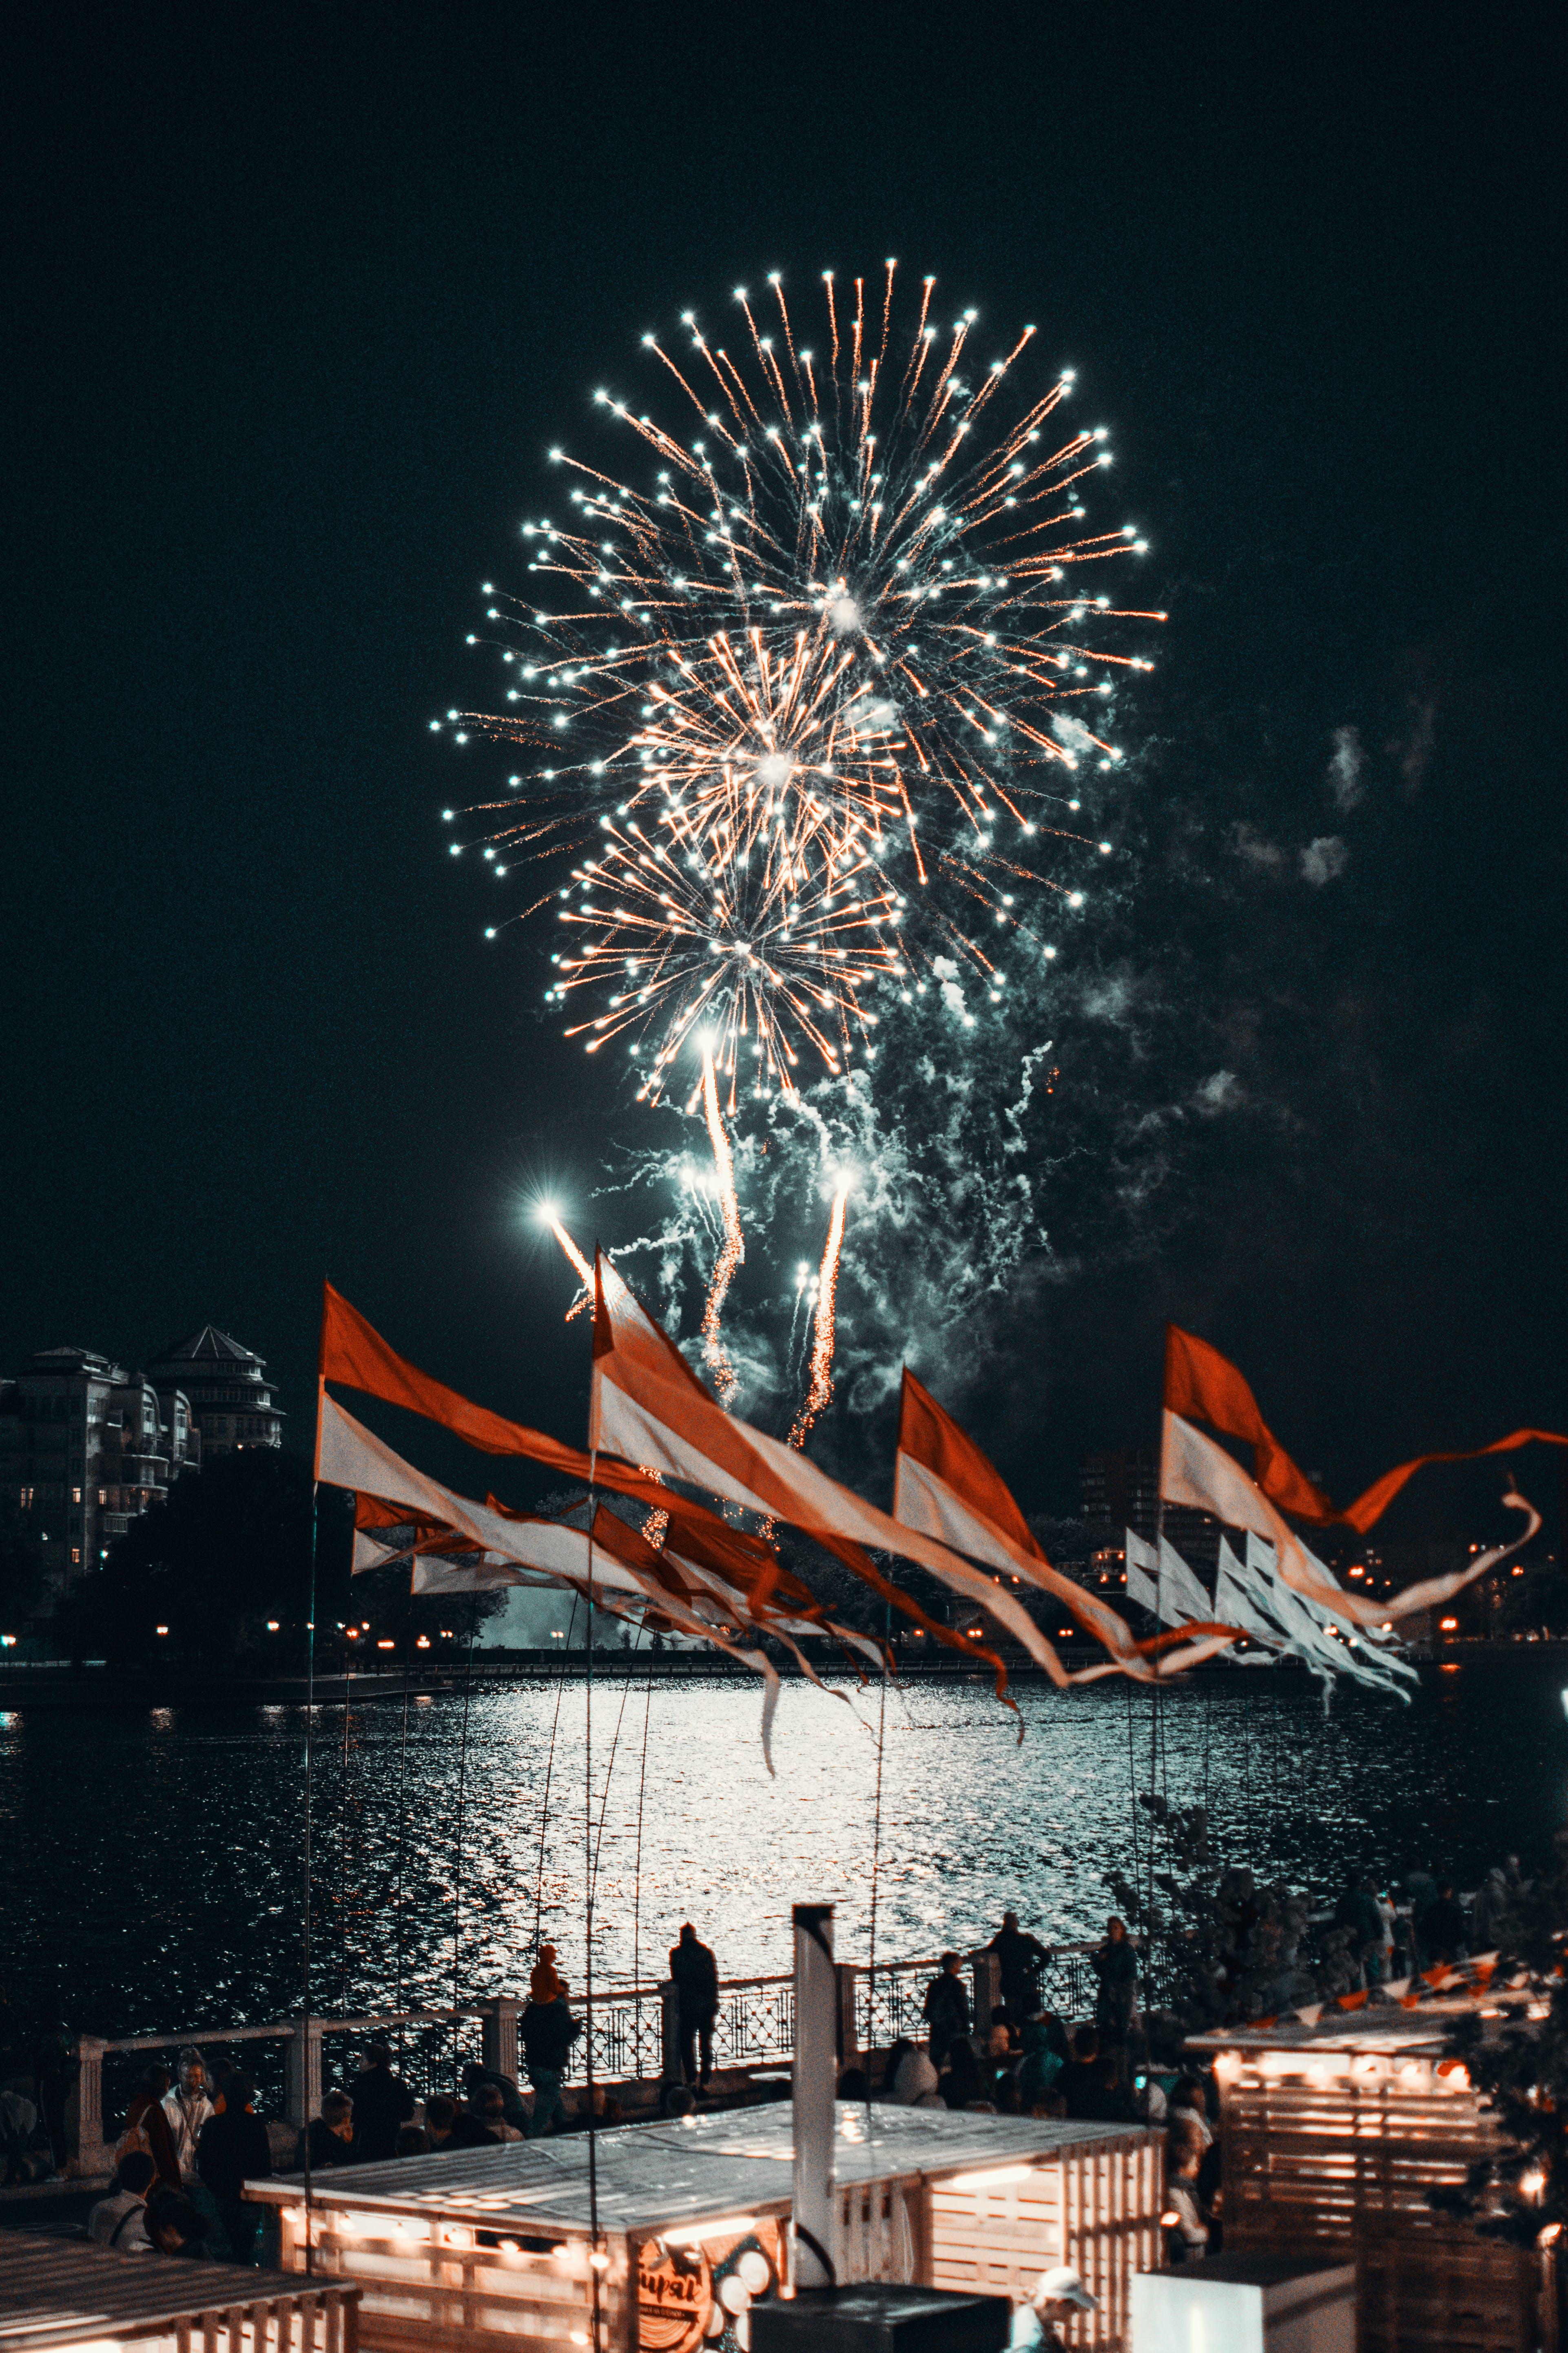 People Watching Fireworks During Night